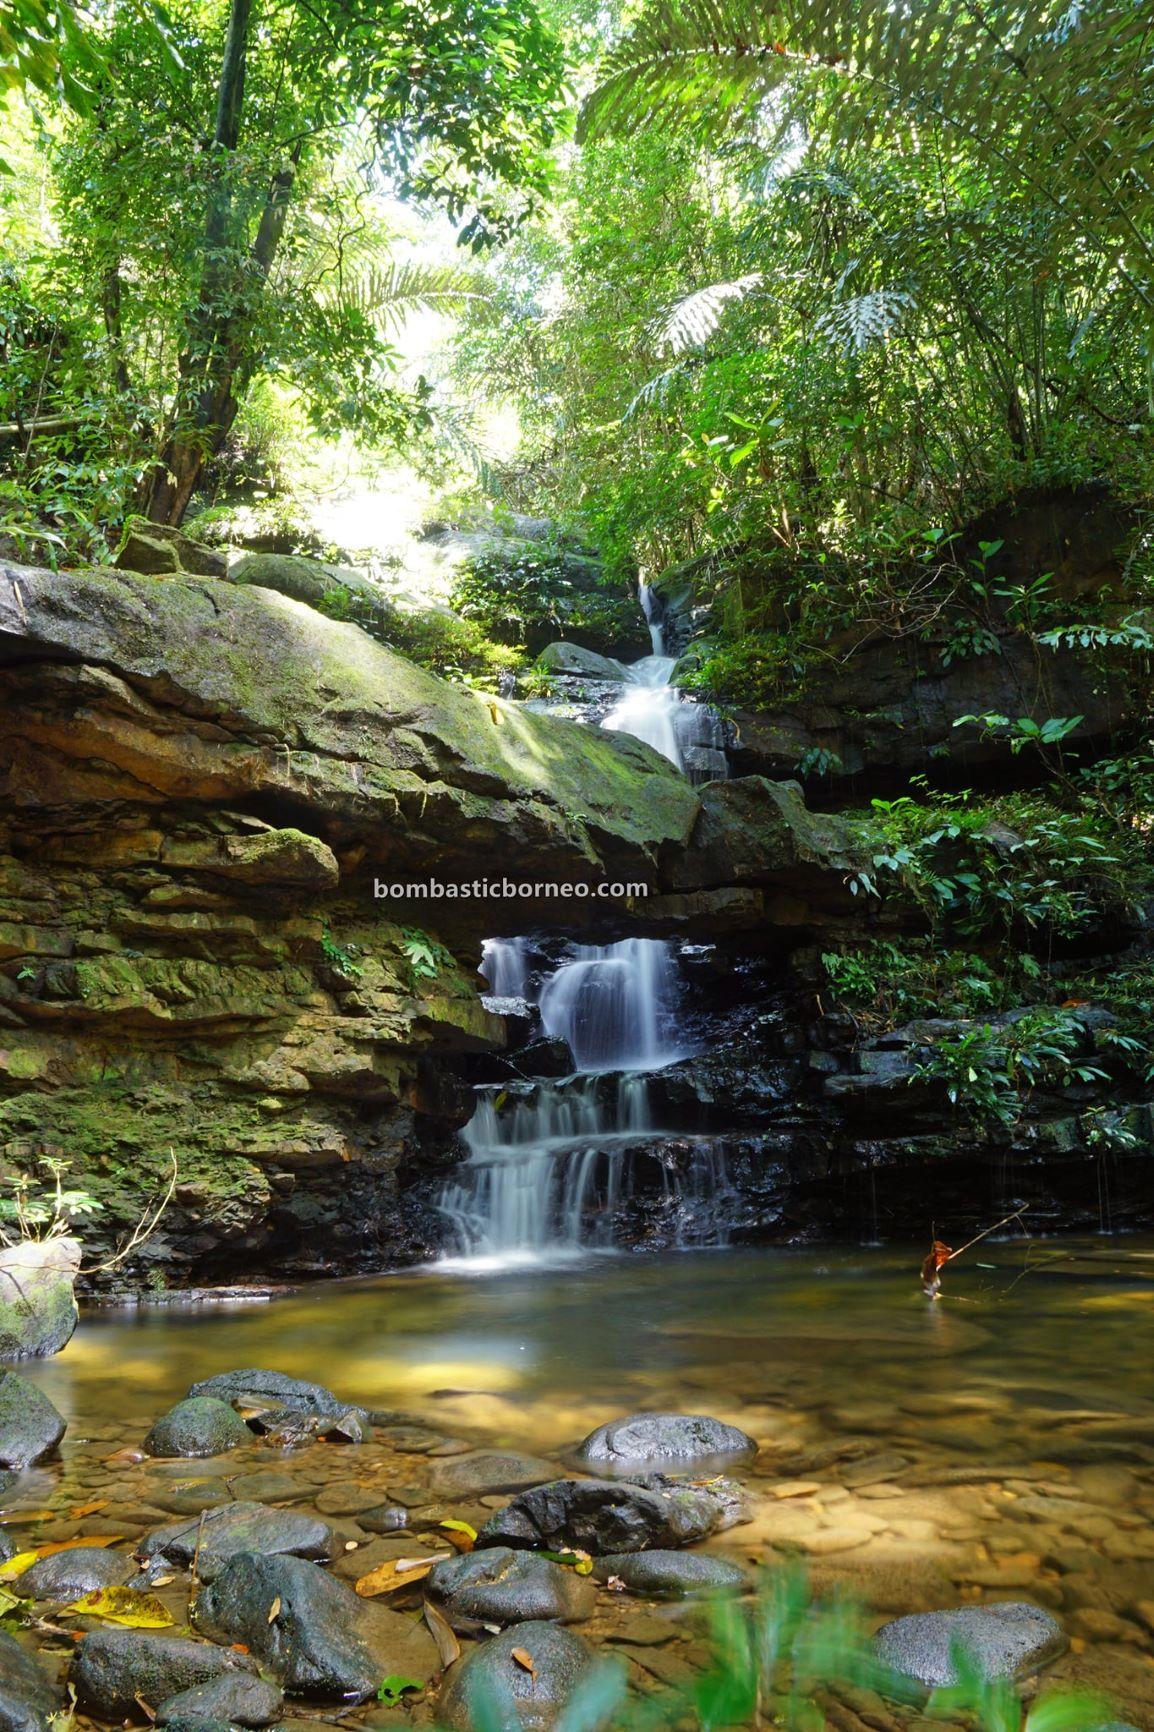 Air Terjun Satow, waterfall, Kampung Bobak, adventure, nature, trekking, destination, Bau, Kuching, Sarawak, Malaysia, tarikan pelancong, Tourism, travel local, Trans Borneo